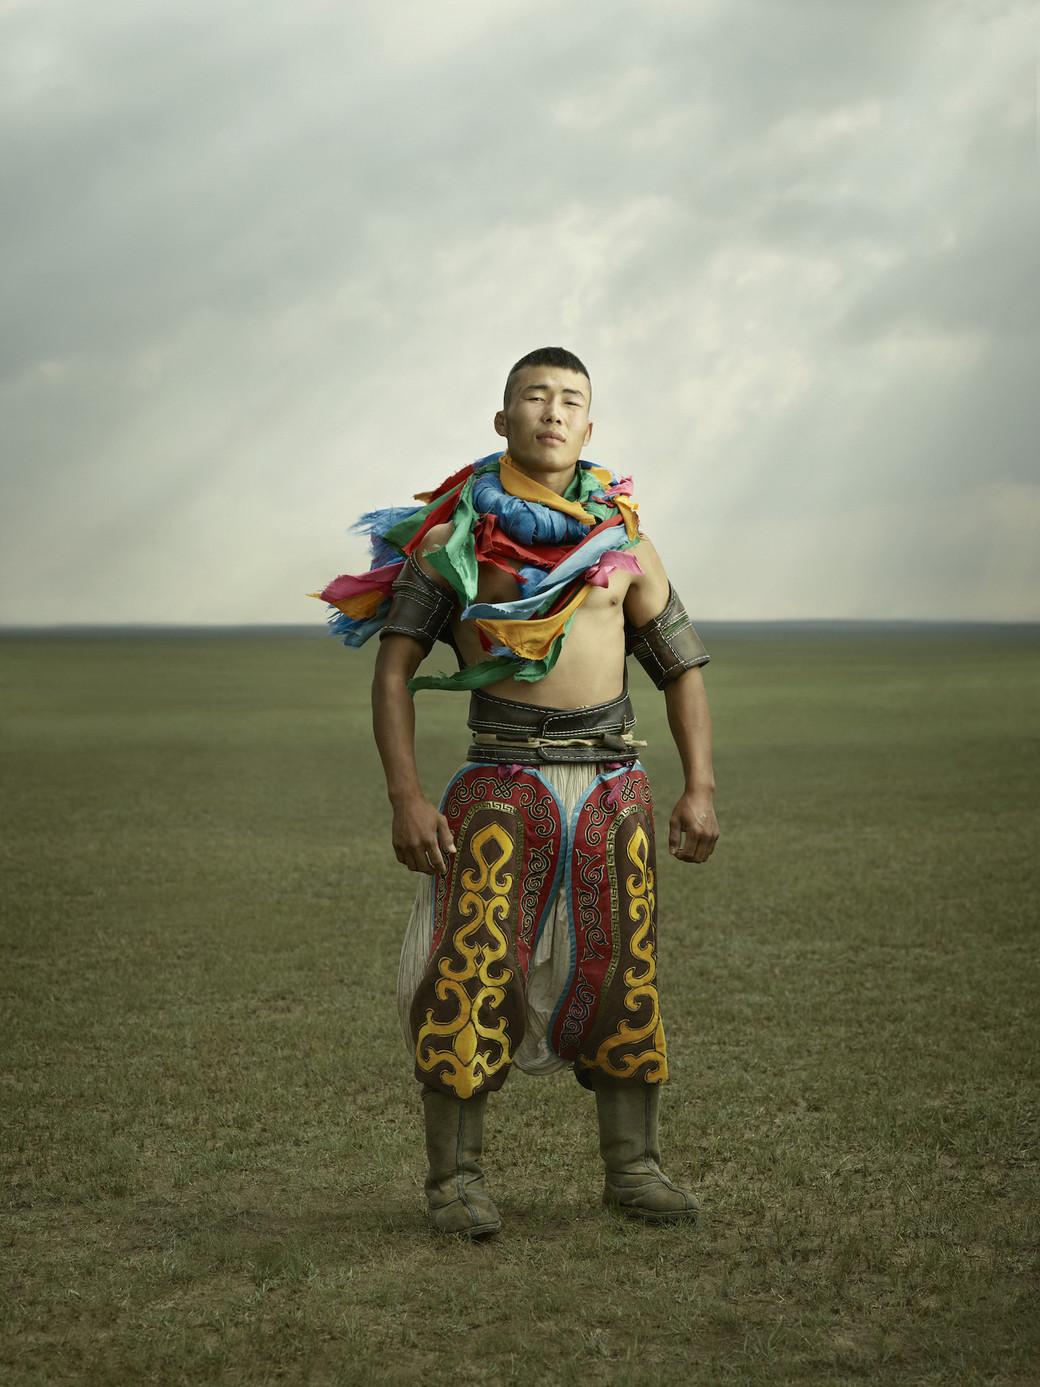 Mongolia wrestling pants portrait young man